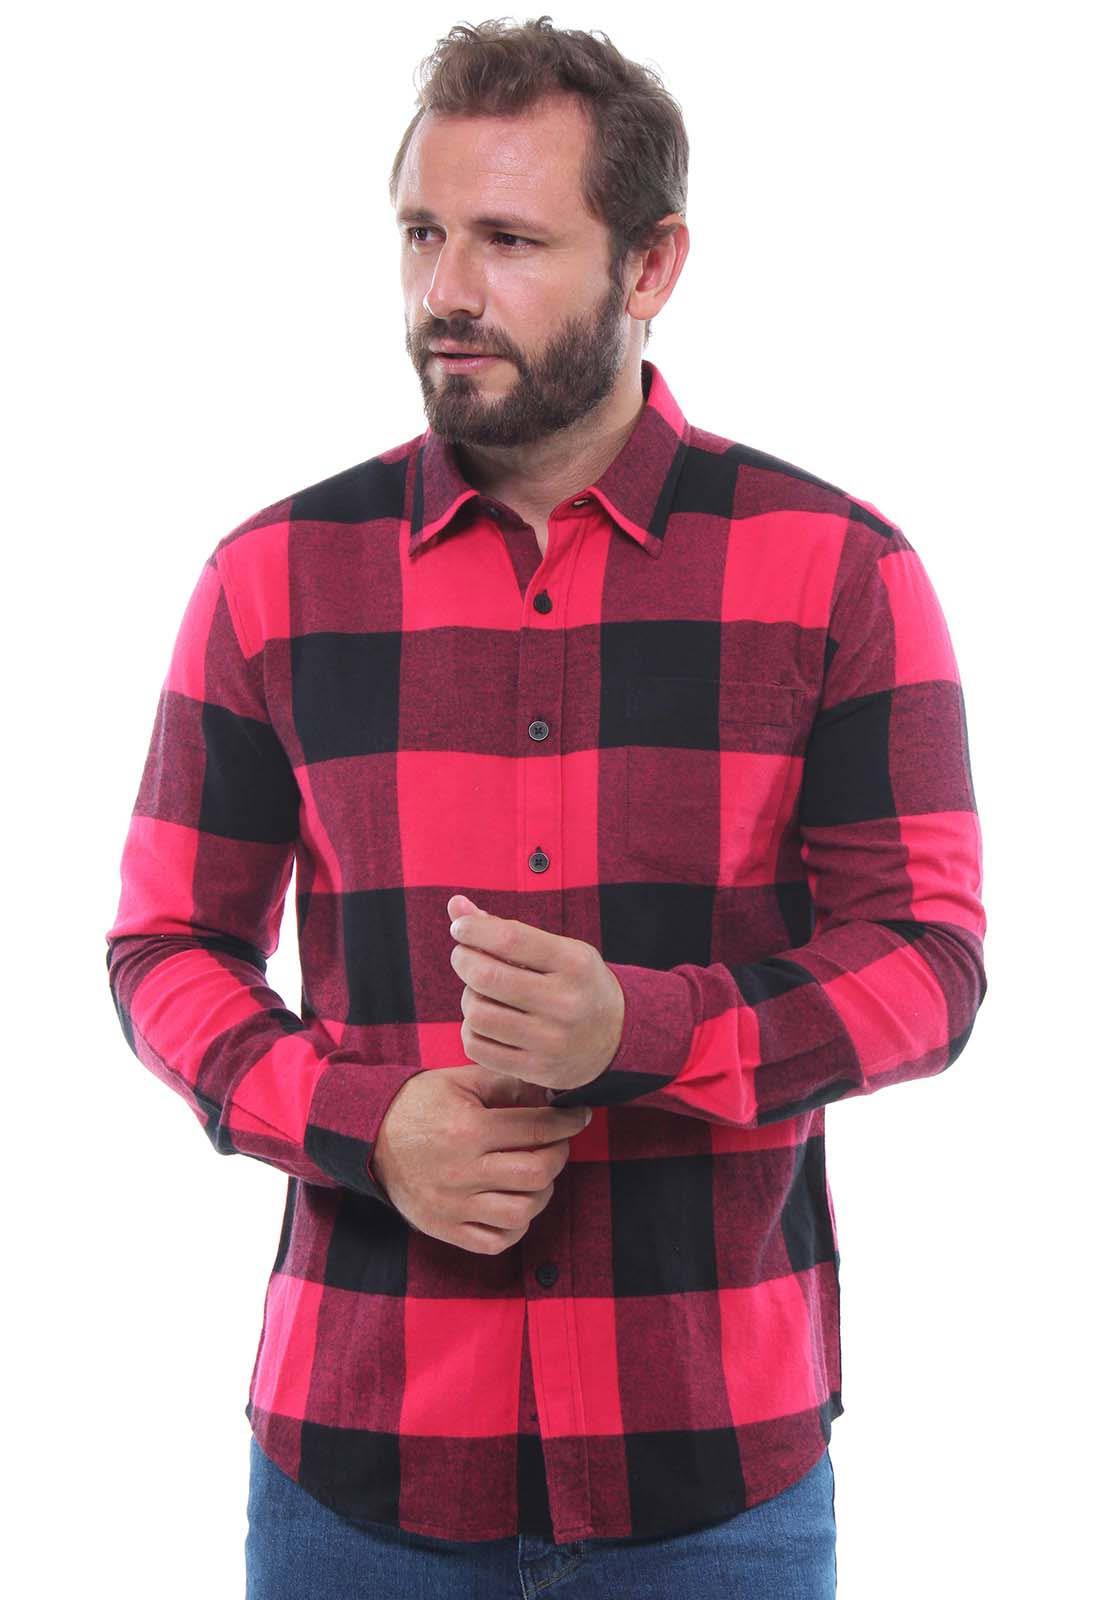 Camisa Xadrez Masculina Flanelada Manga Longa Crocker - 47397  - CROCKER JEANS